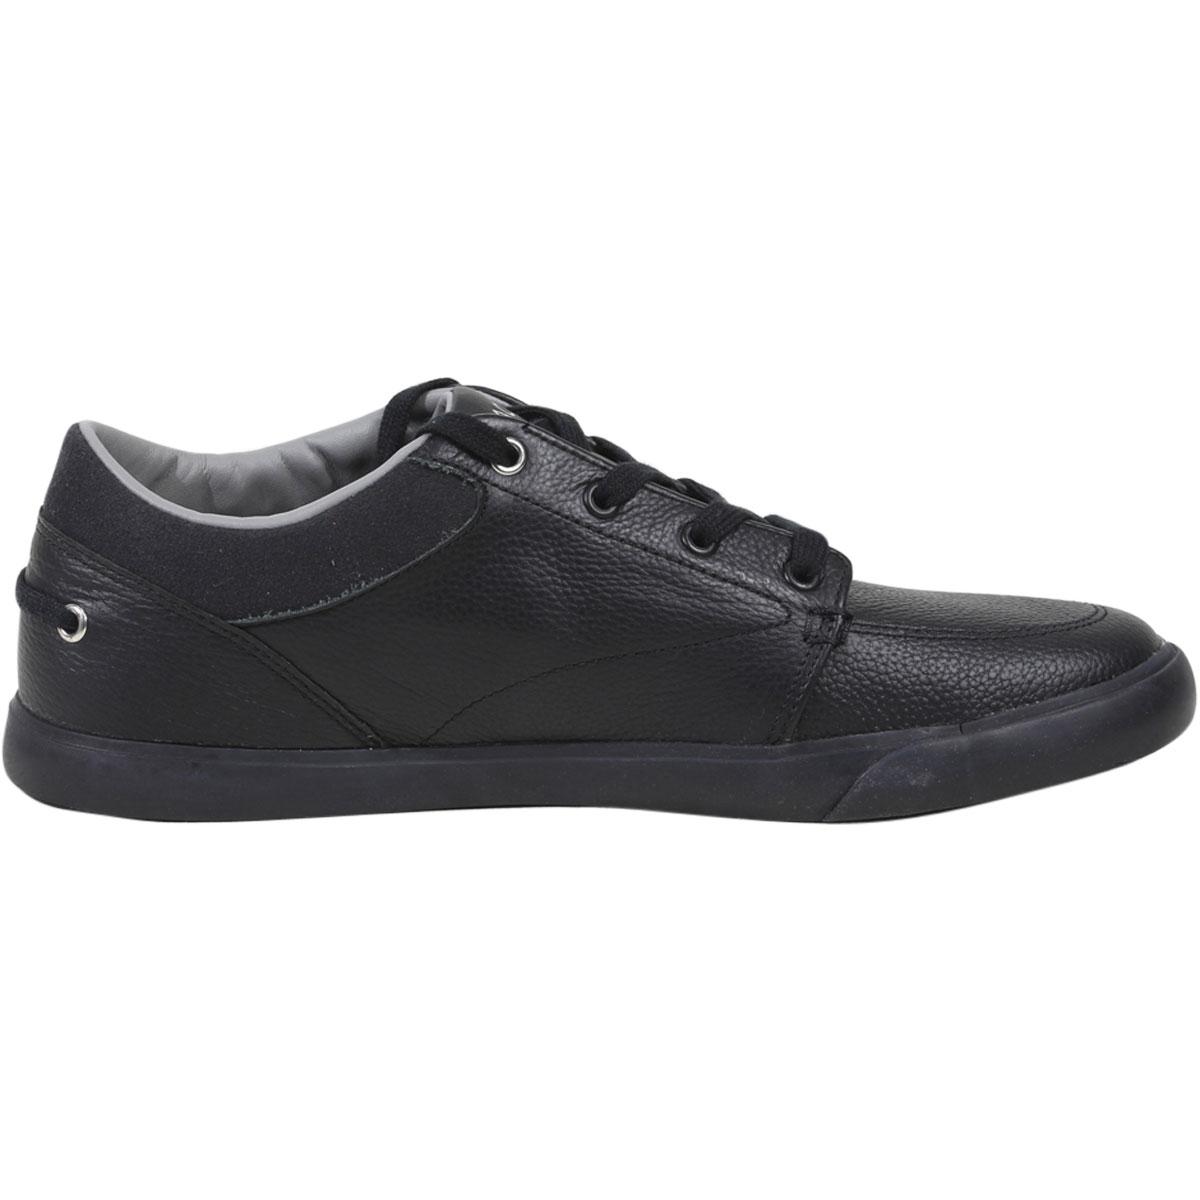 Lacoste-Men-039-s-Bayliss-118-Sneakers-Shoes thumbnail 11